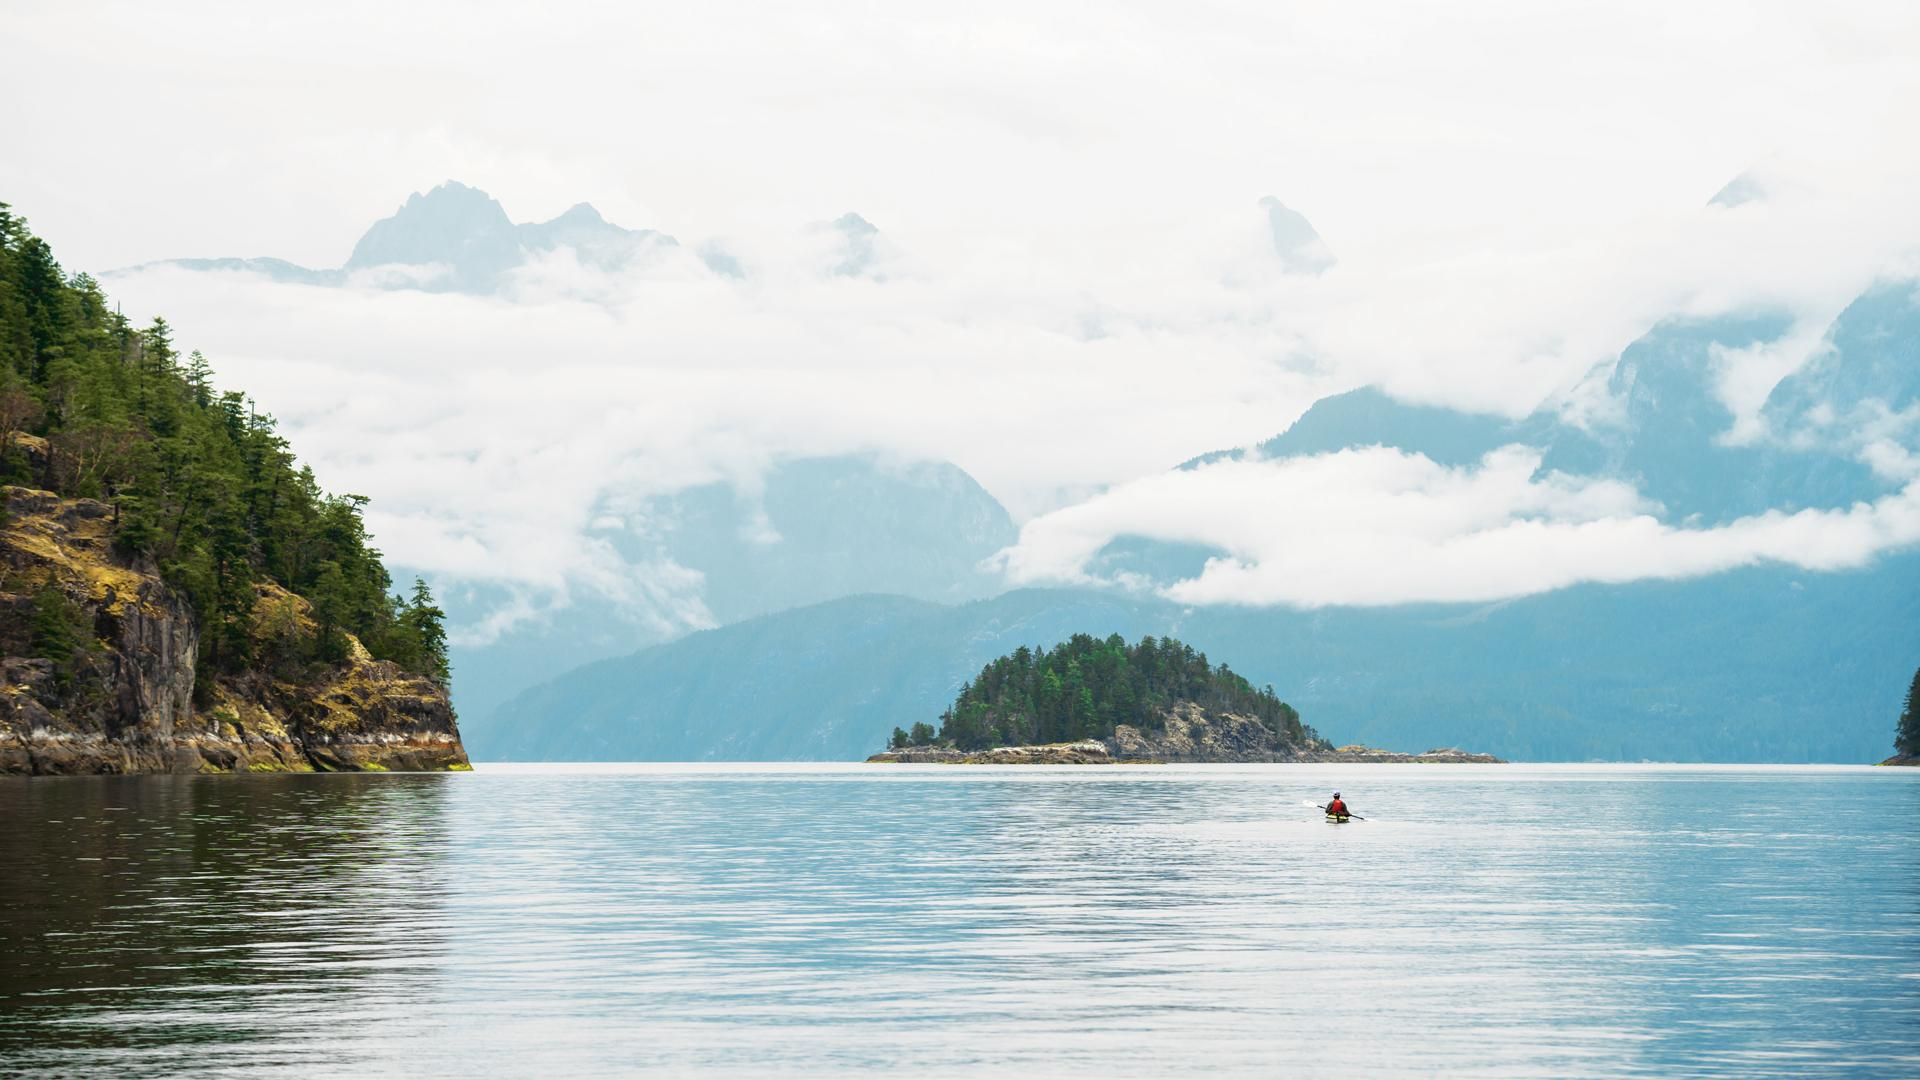 Sunshine Coast, B.C.